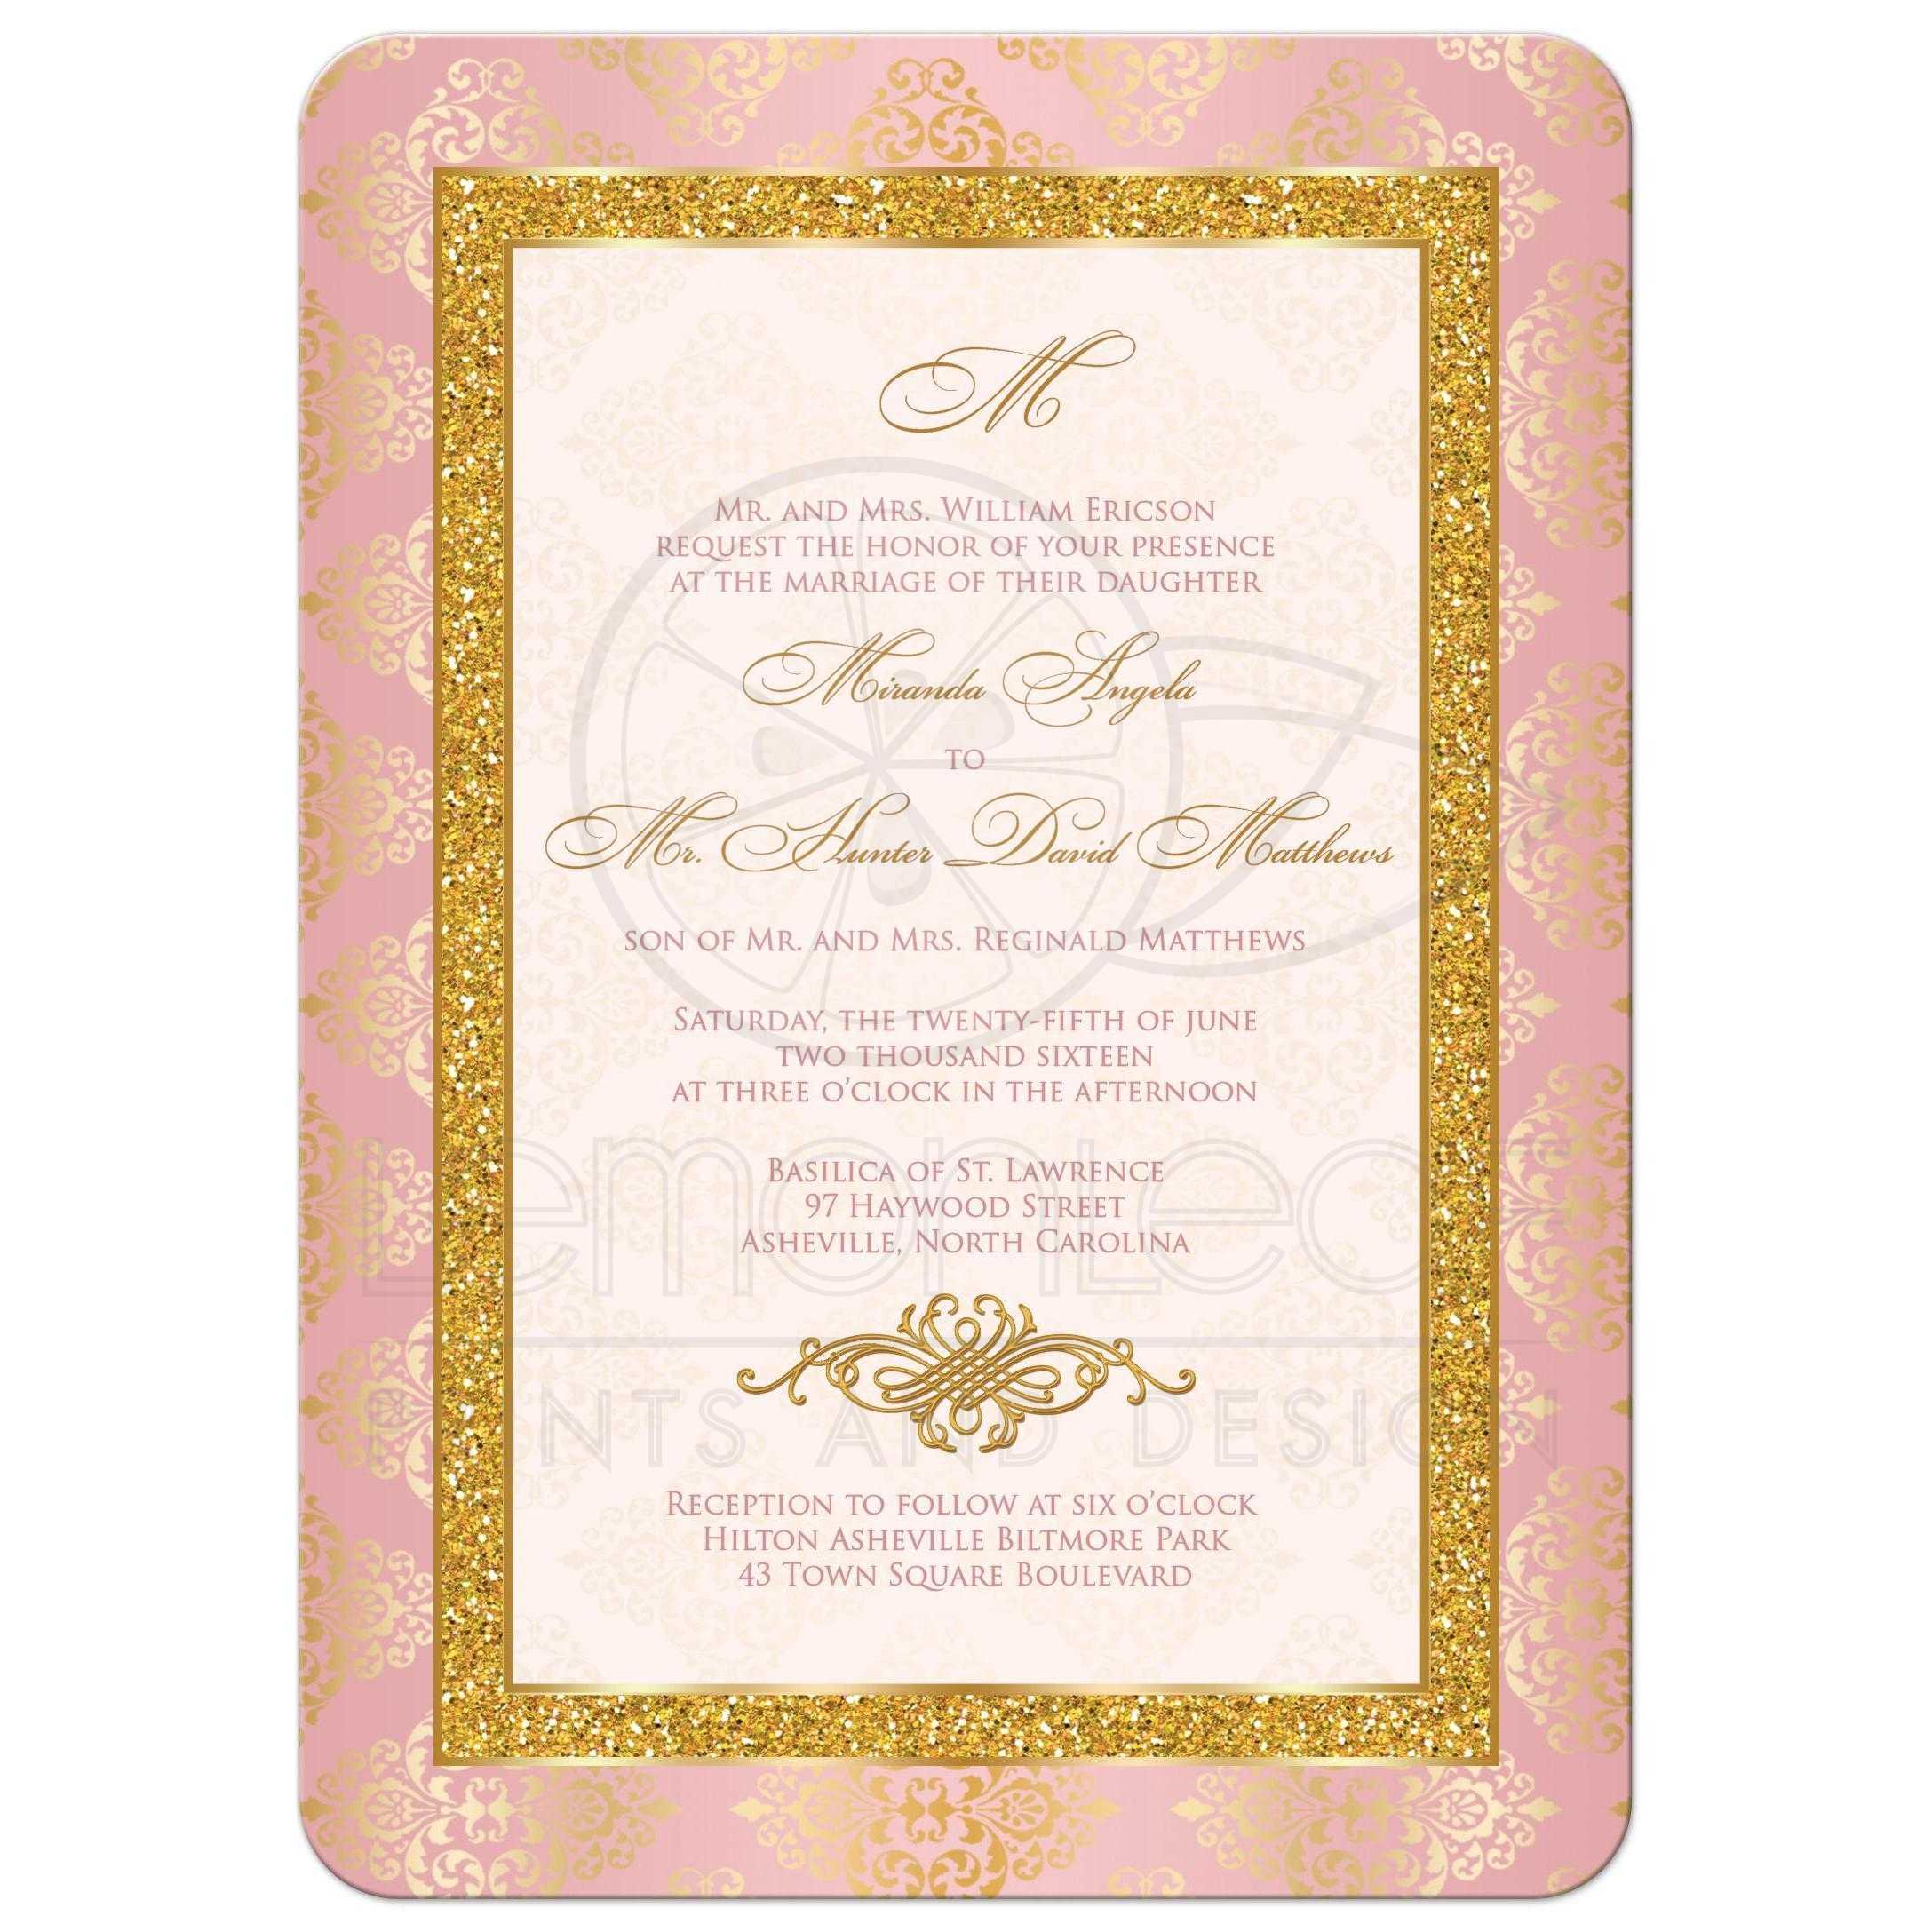 Gold And Blush Wedding Invitations: Victorian Elegance